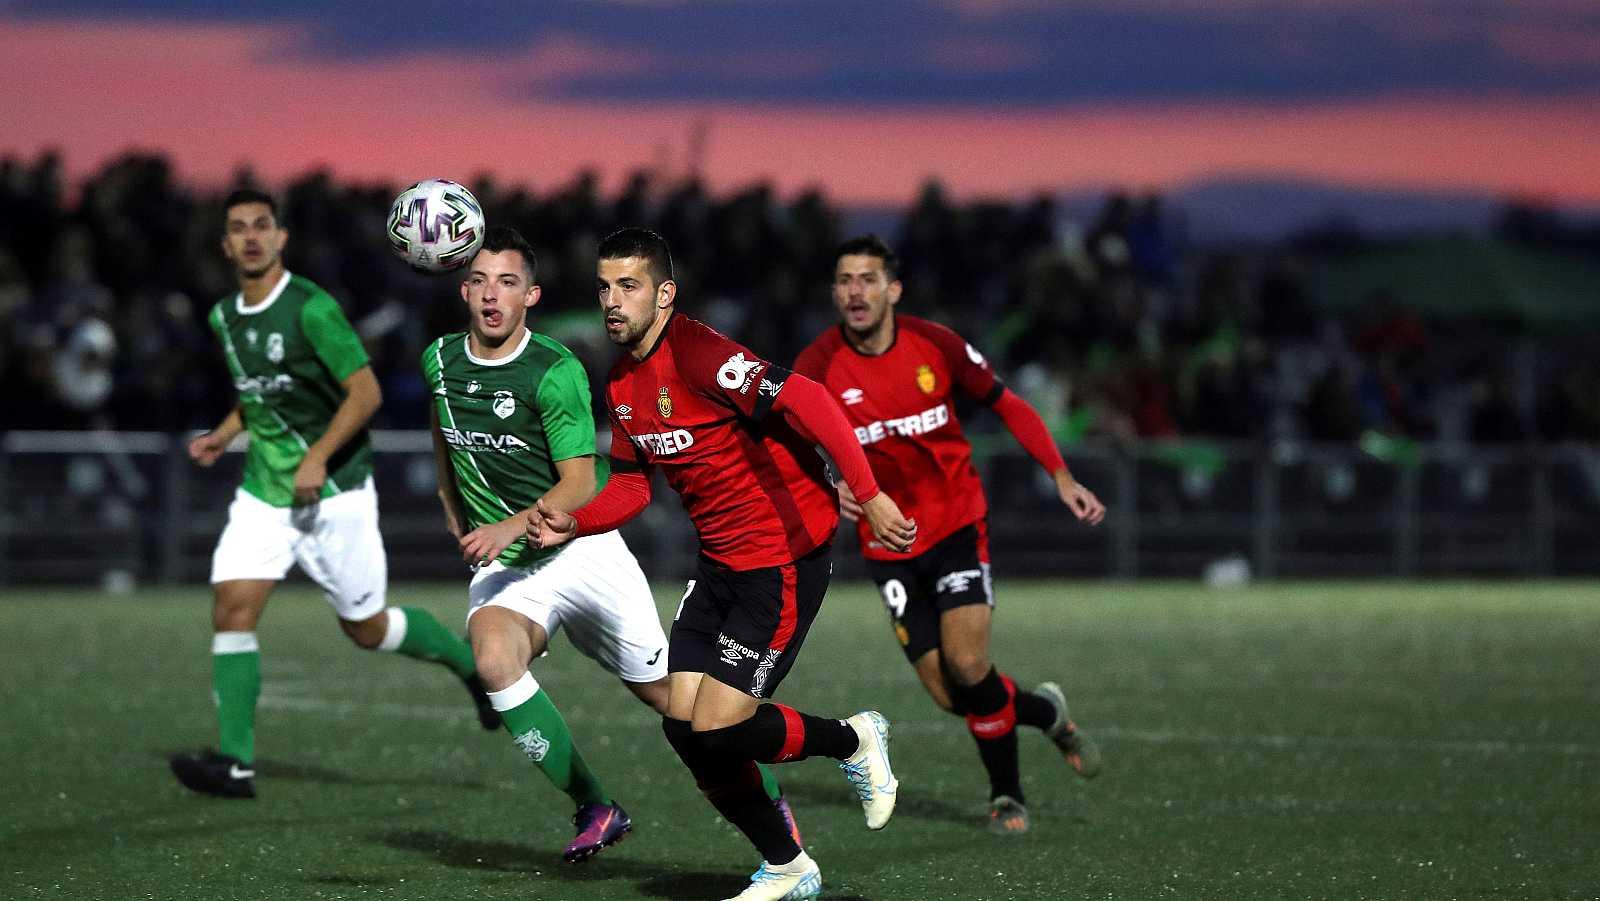 El Mallorca vence al Álamo en la primera ronda de Copa